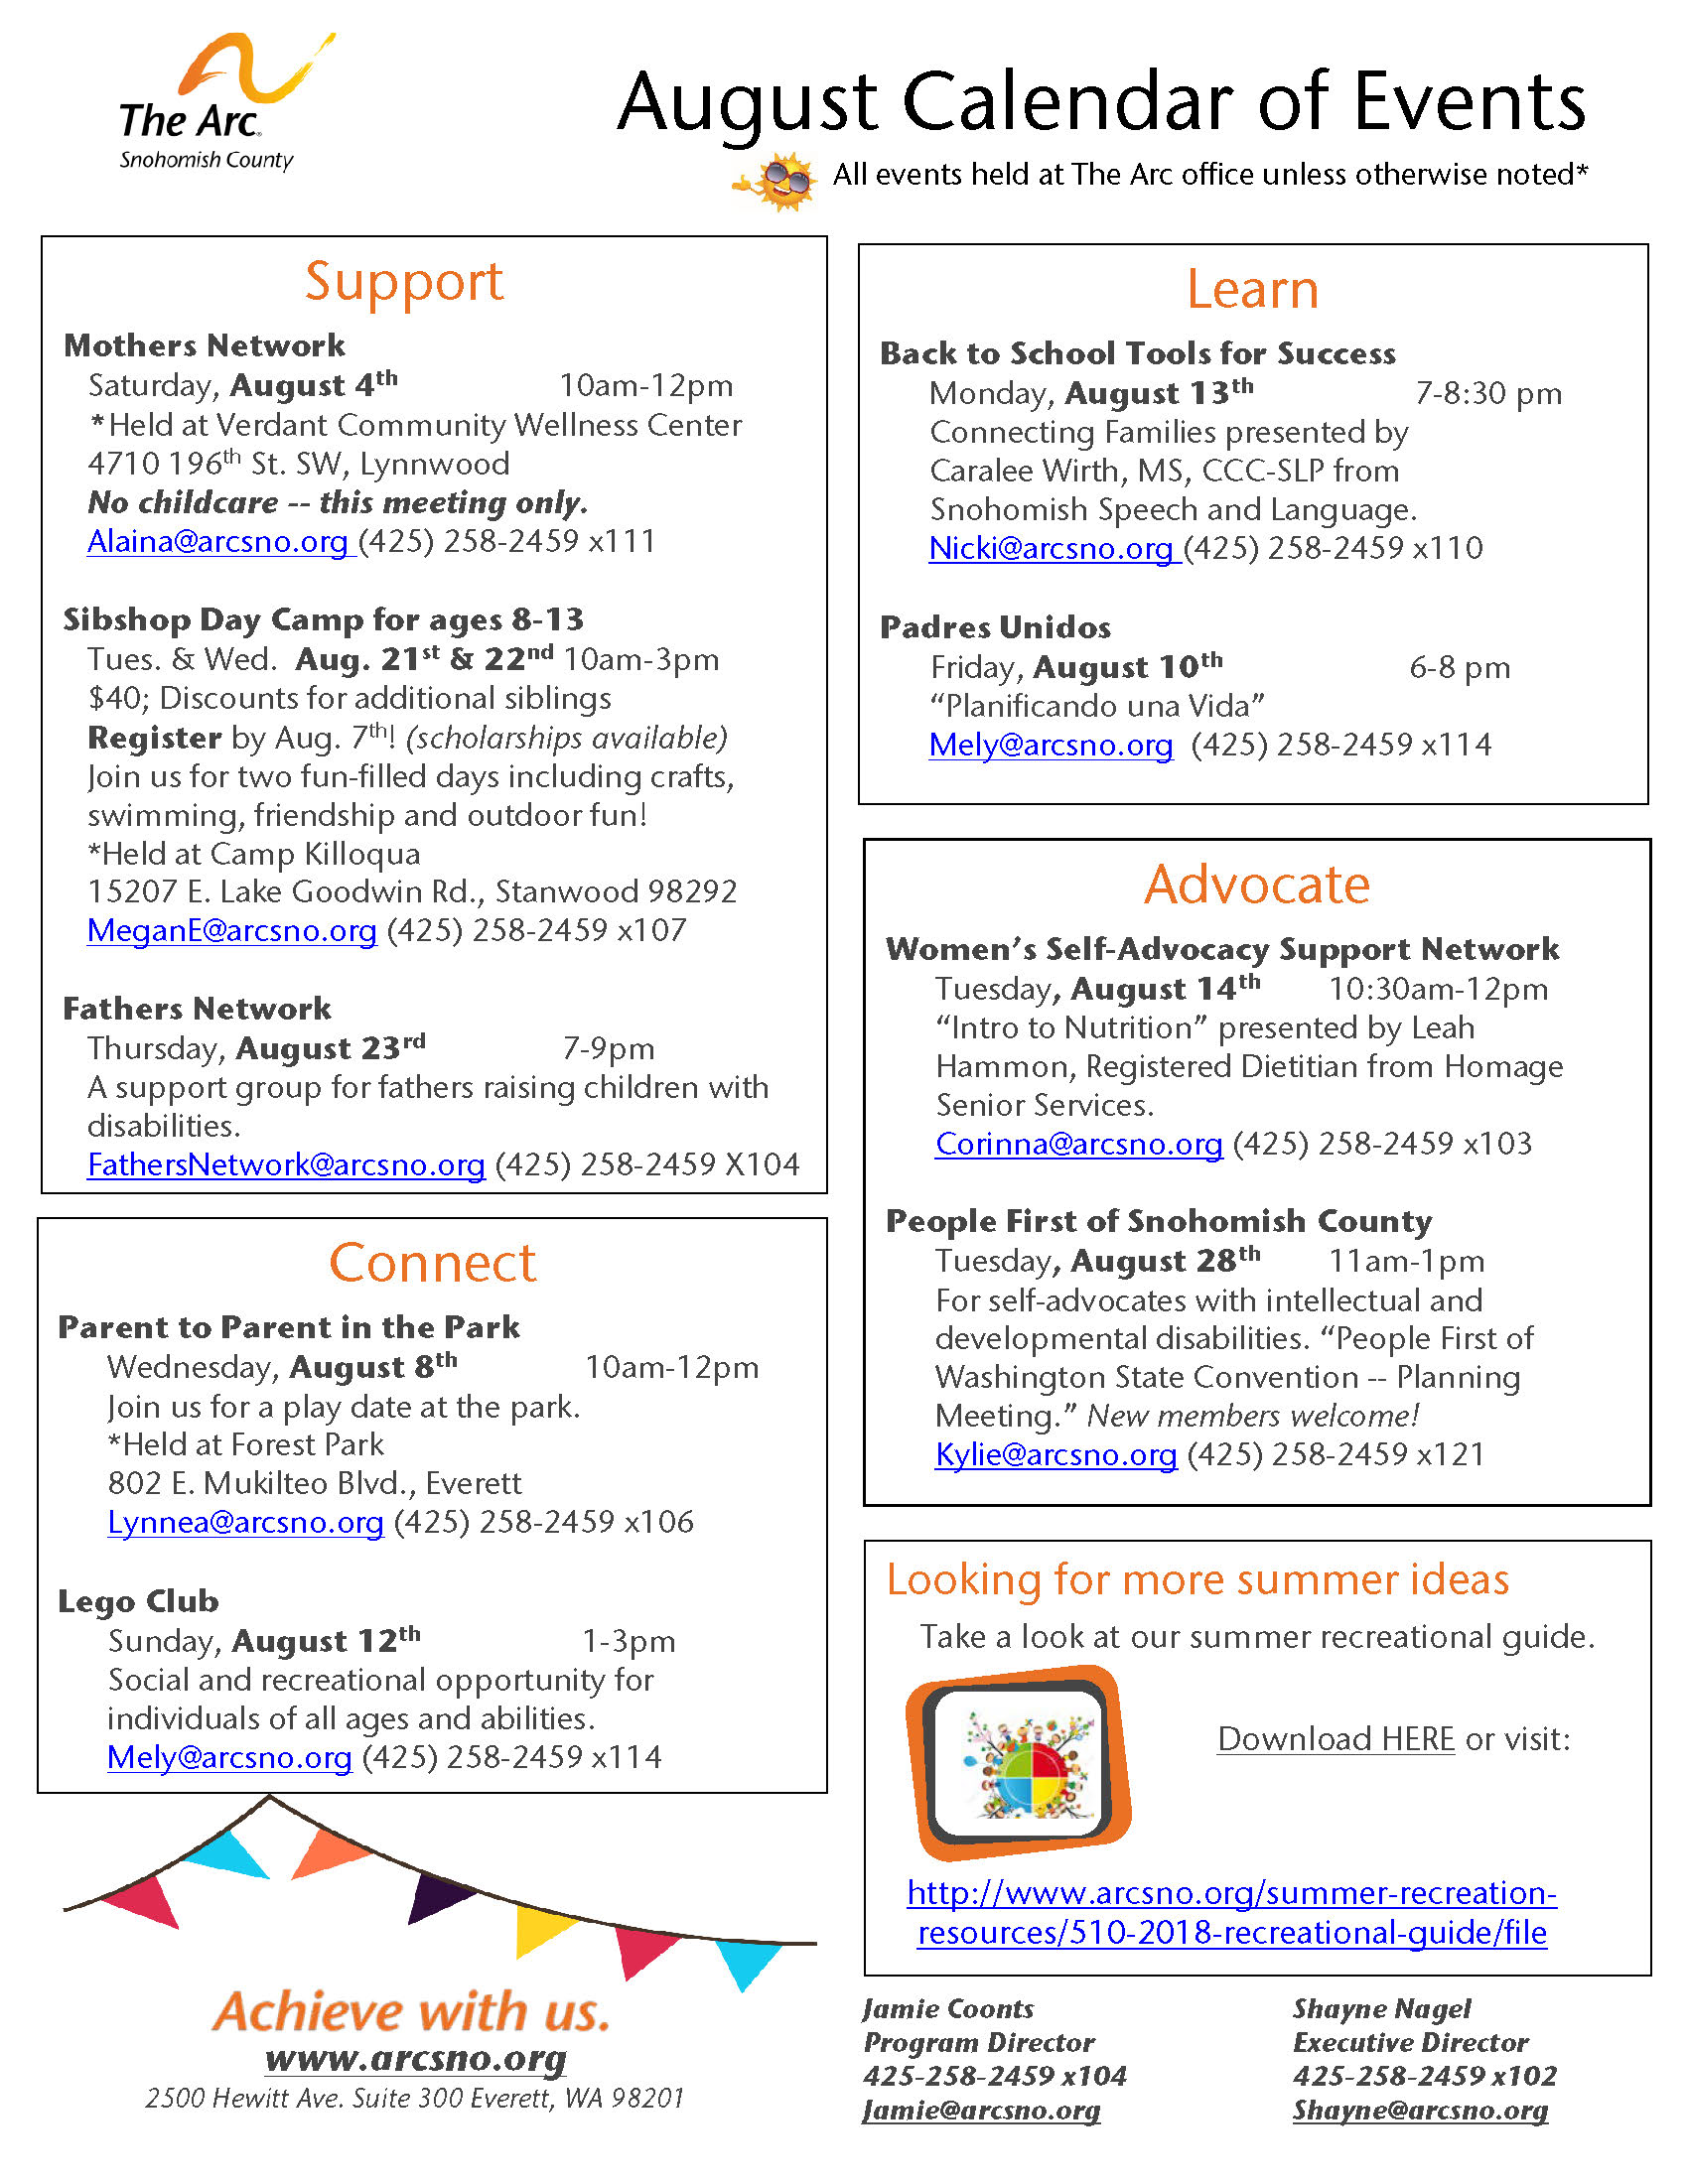 Arc August 2018 Calendar of Events